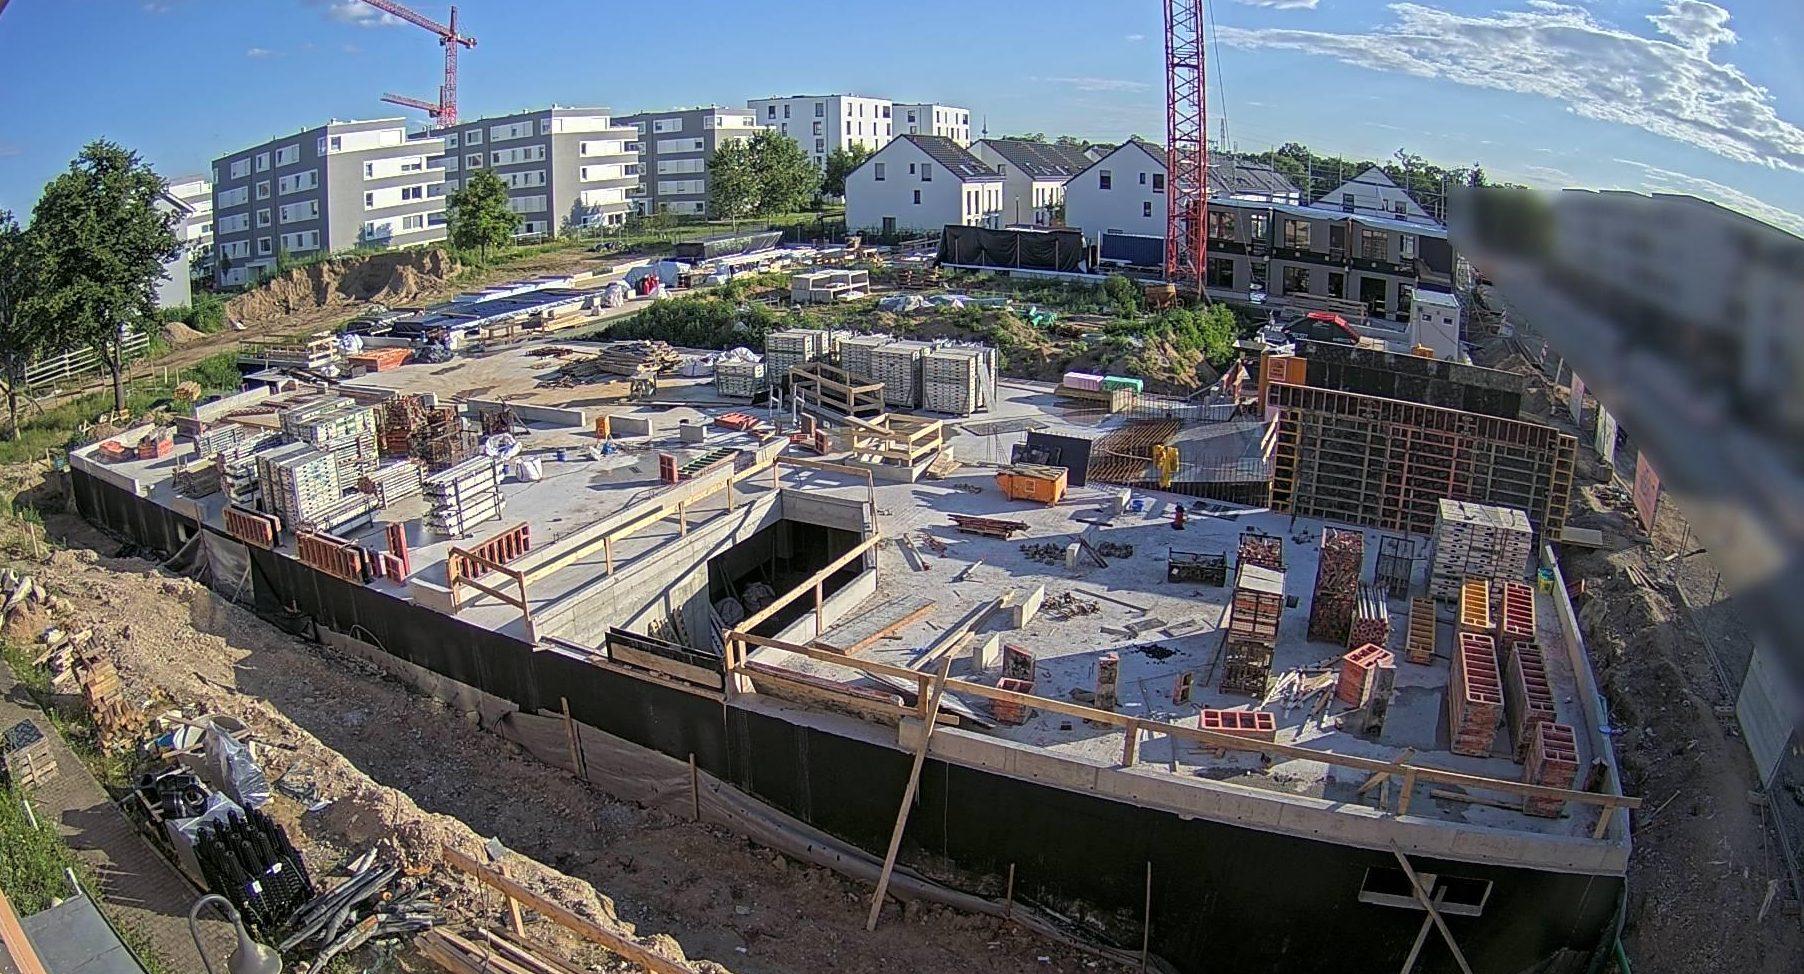 Baustellenbild 07.07.2021